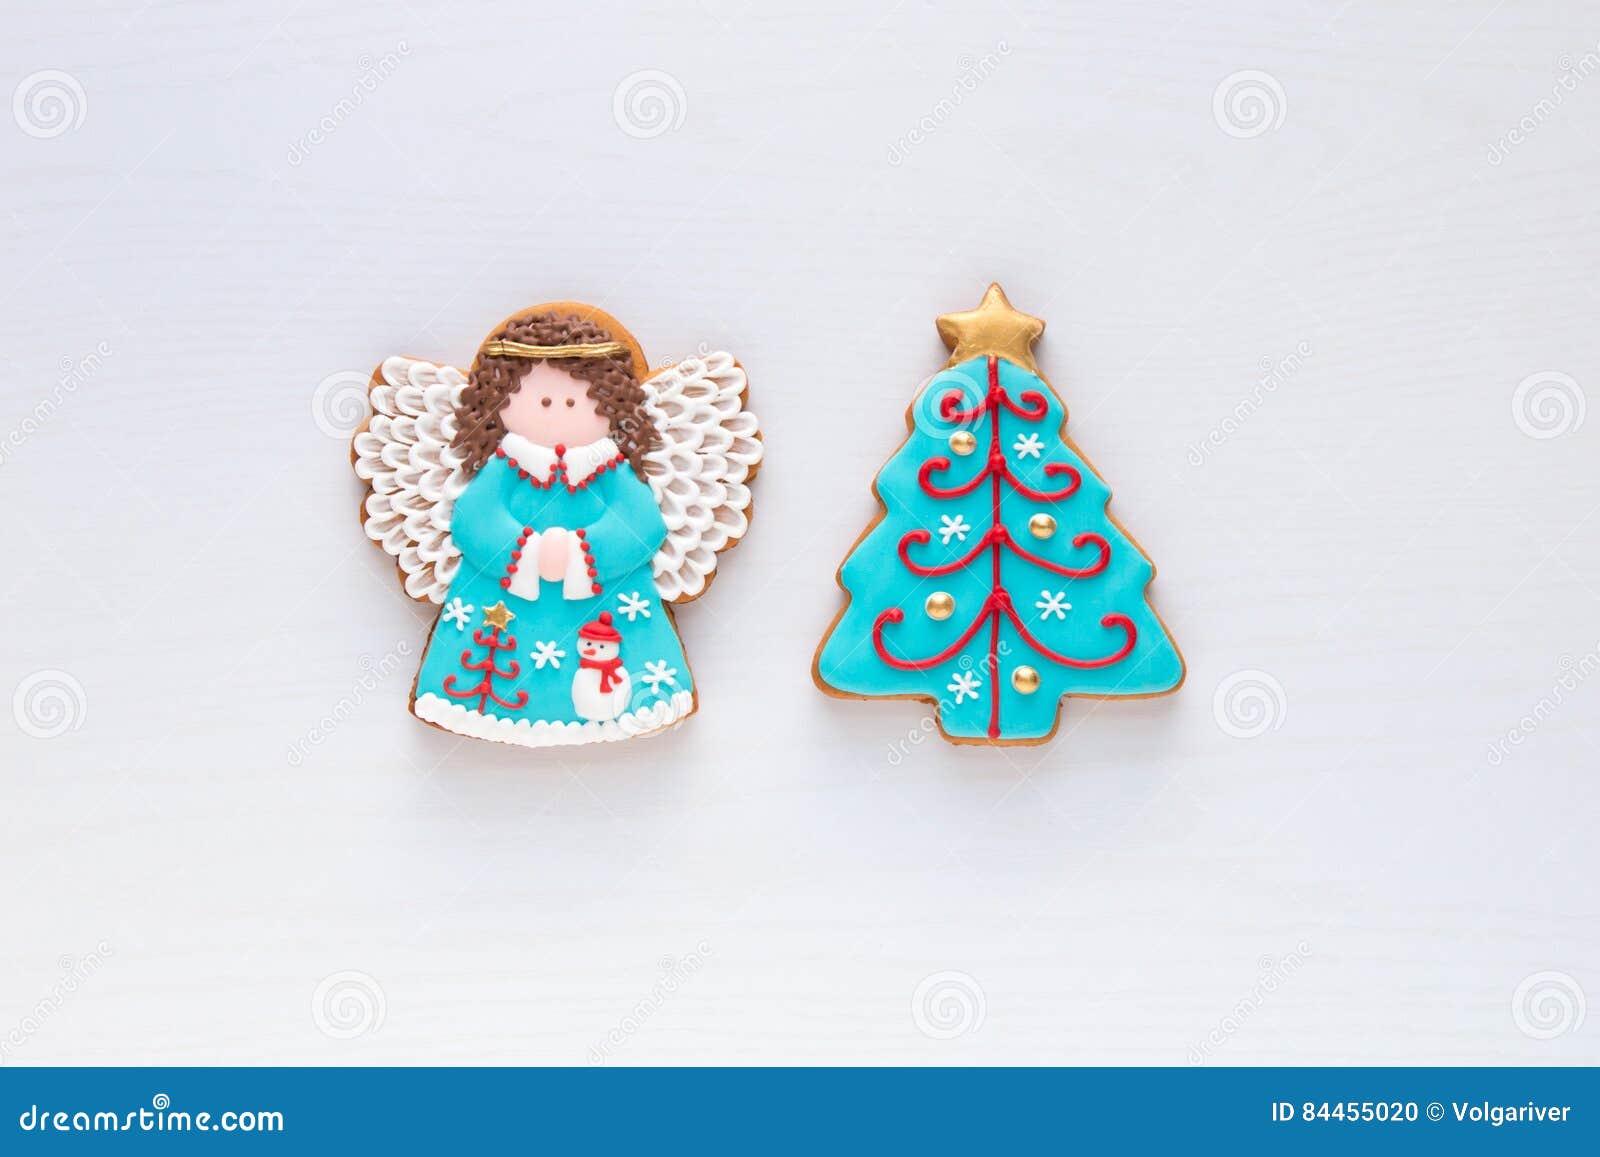 Christmas Homemade Gingerbread Angel And Christmas Tree Cookies